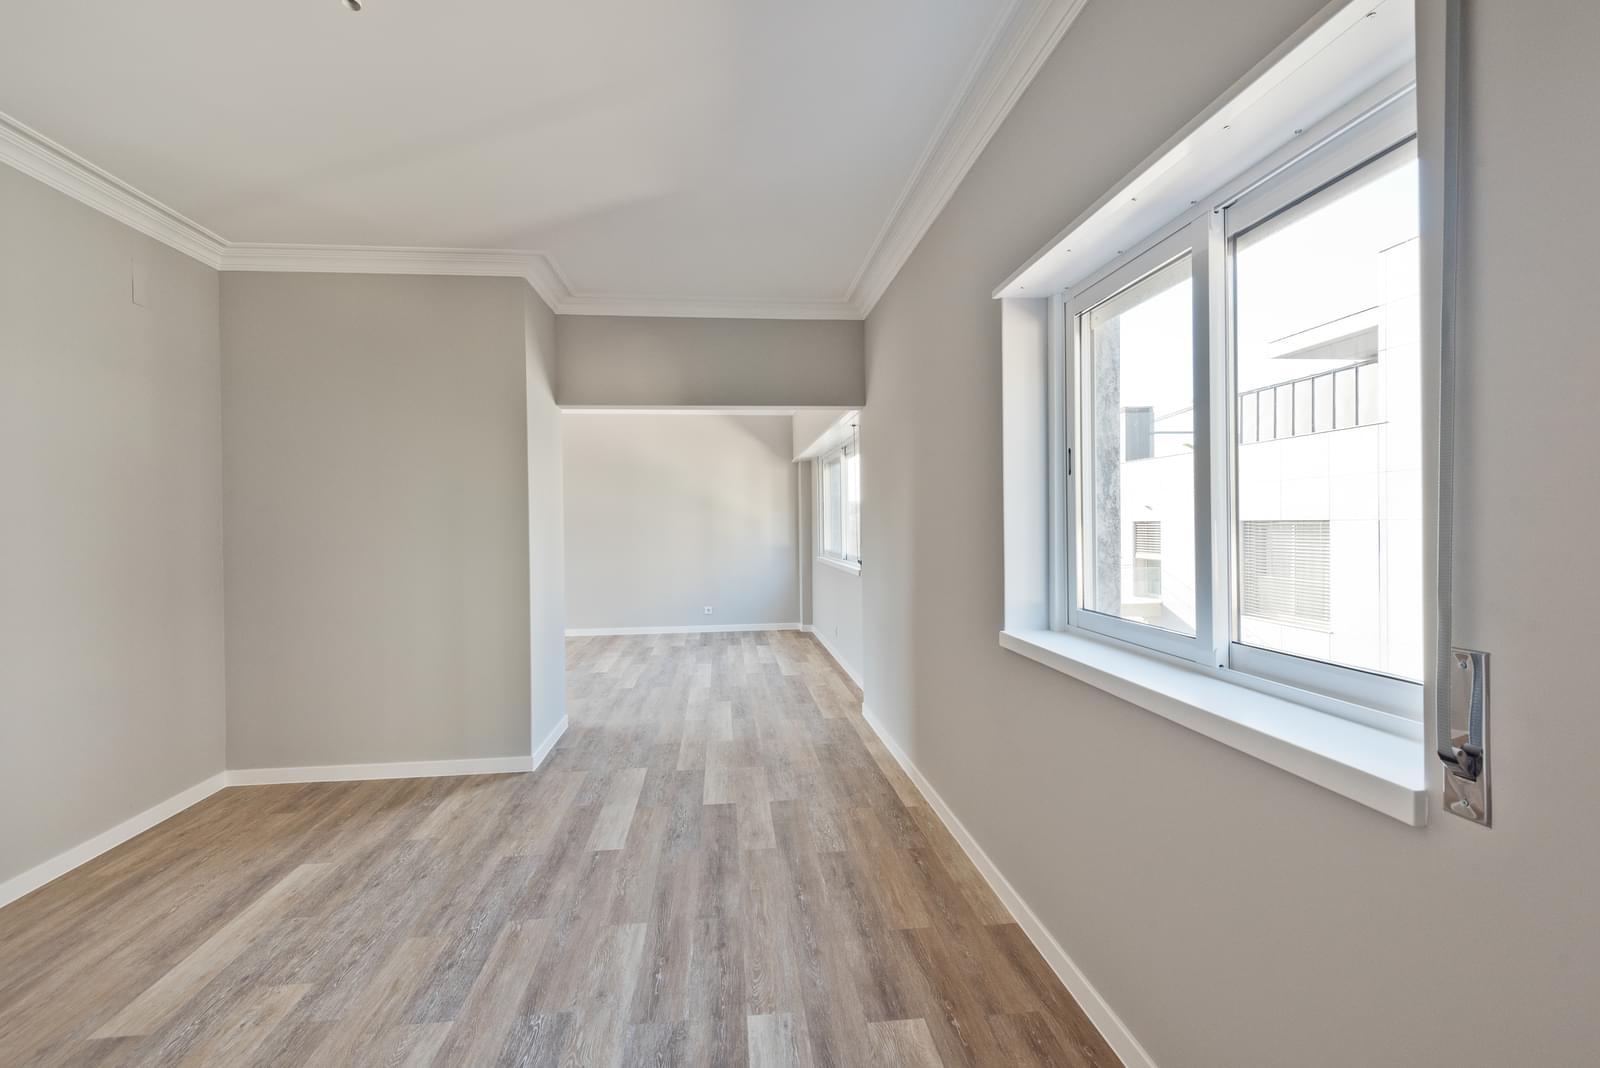 pf18956-apartamento-t3-1-cascais-ce6d2ffb-77c6-4f5c-95e1-2201f7b6b3a1